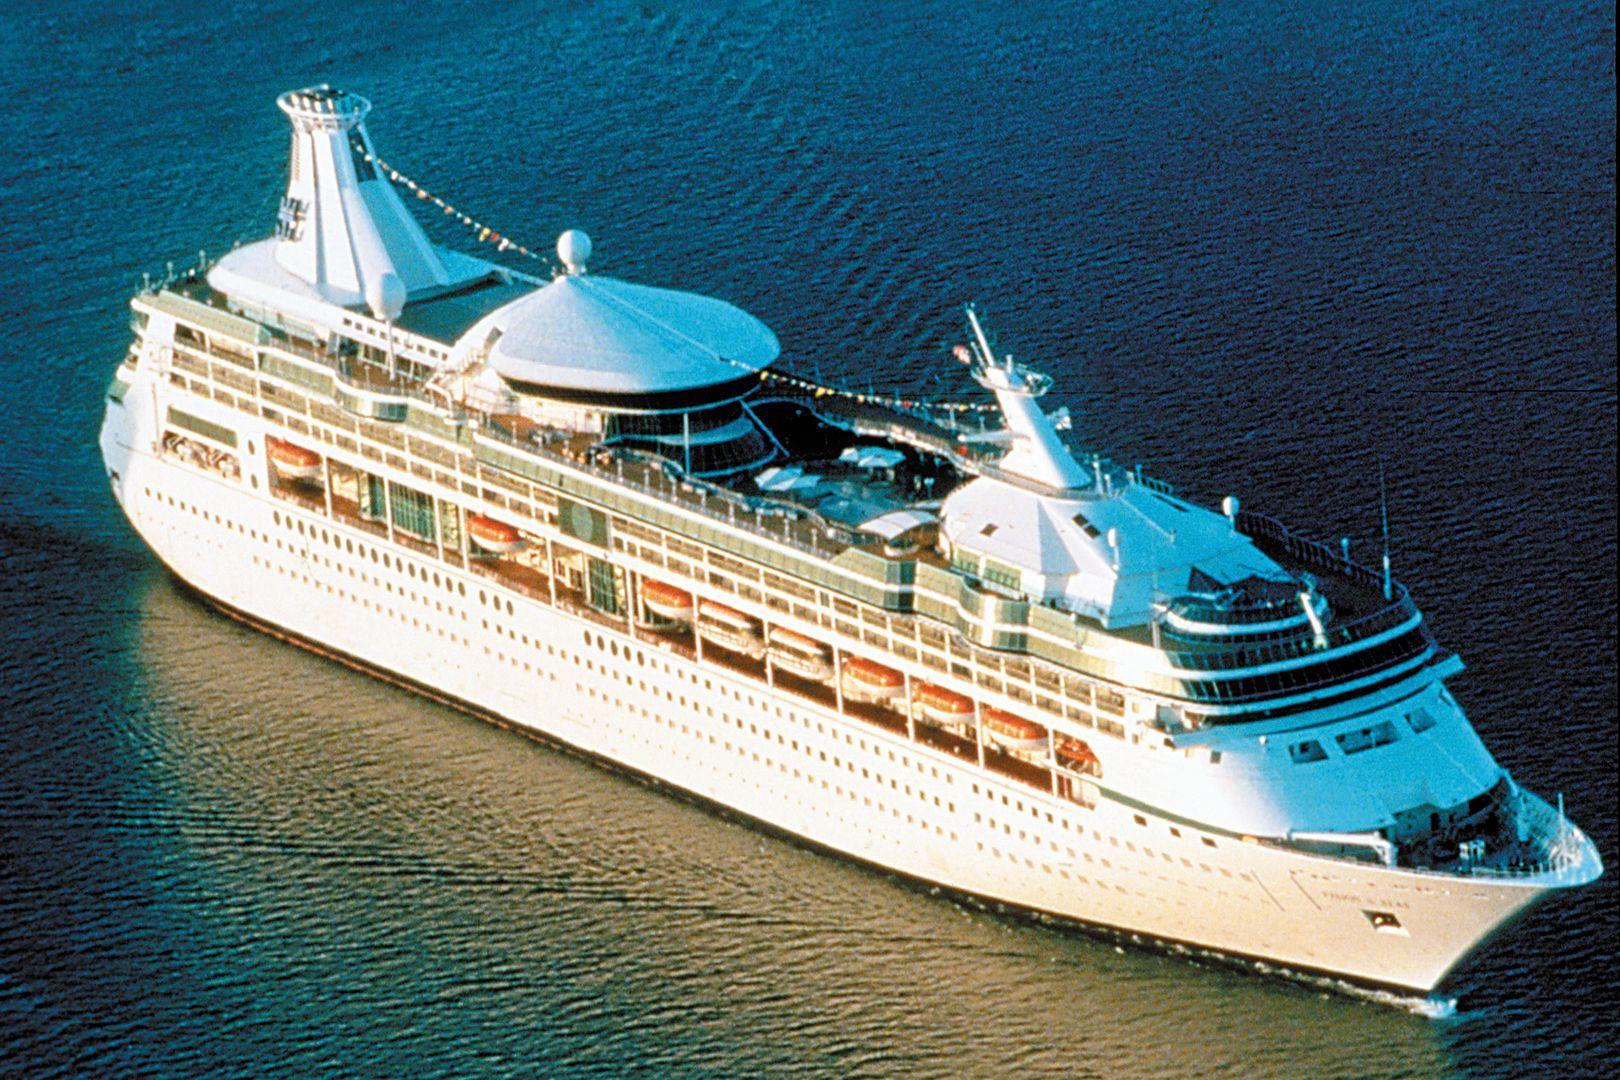 aebce63974ed Αναζητήστε την Κρουαζιέρα σας στις καλύτερες τιμές – Cruiseway Travel